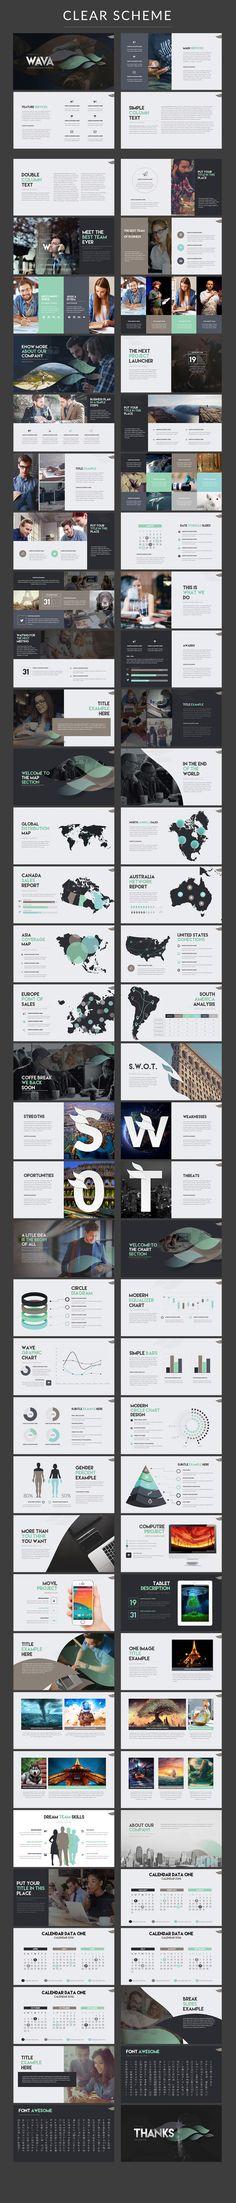 Wava | Powerpoint template + Bonus - Presentations - 9